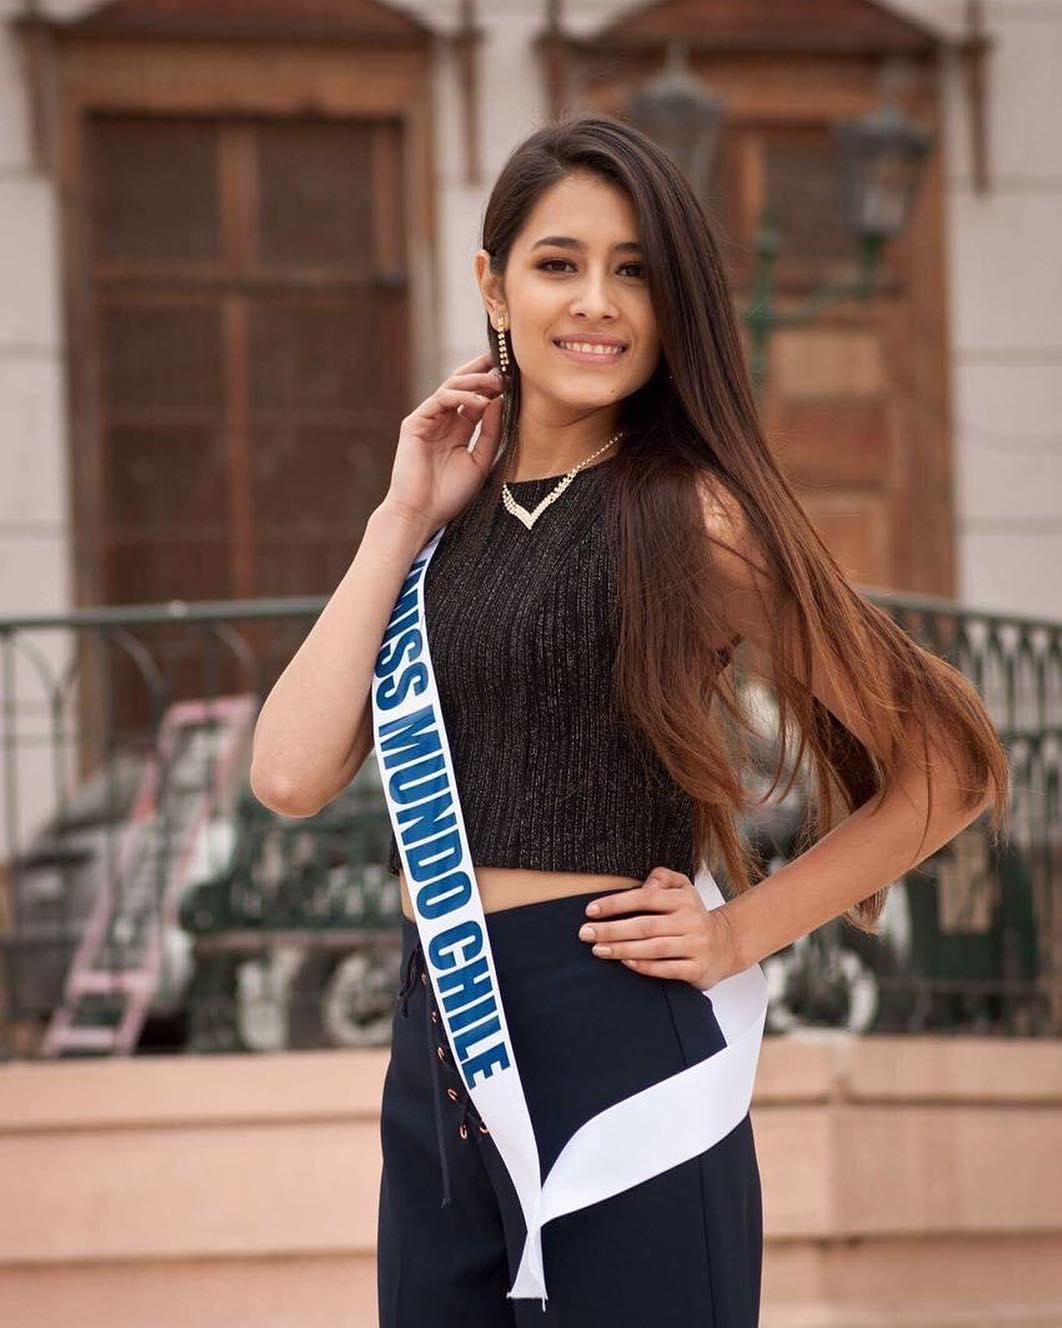 candidatas a miss chile universo 2018. final: 19 agosto. - Página 7 7nsjcnc3